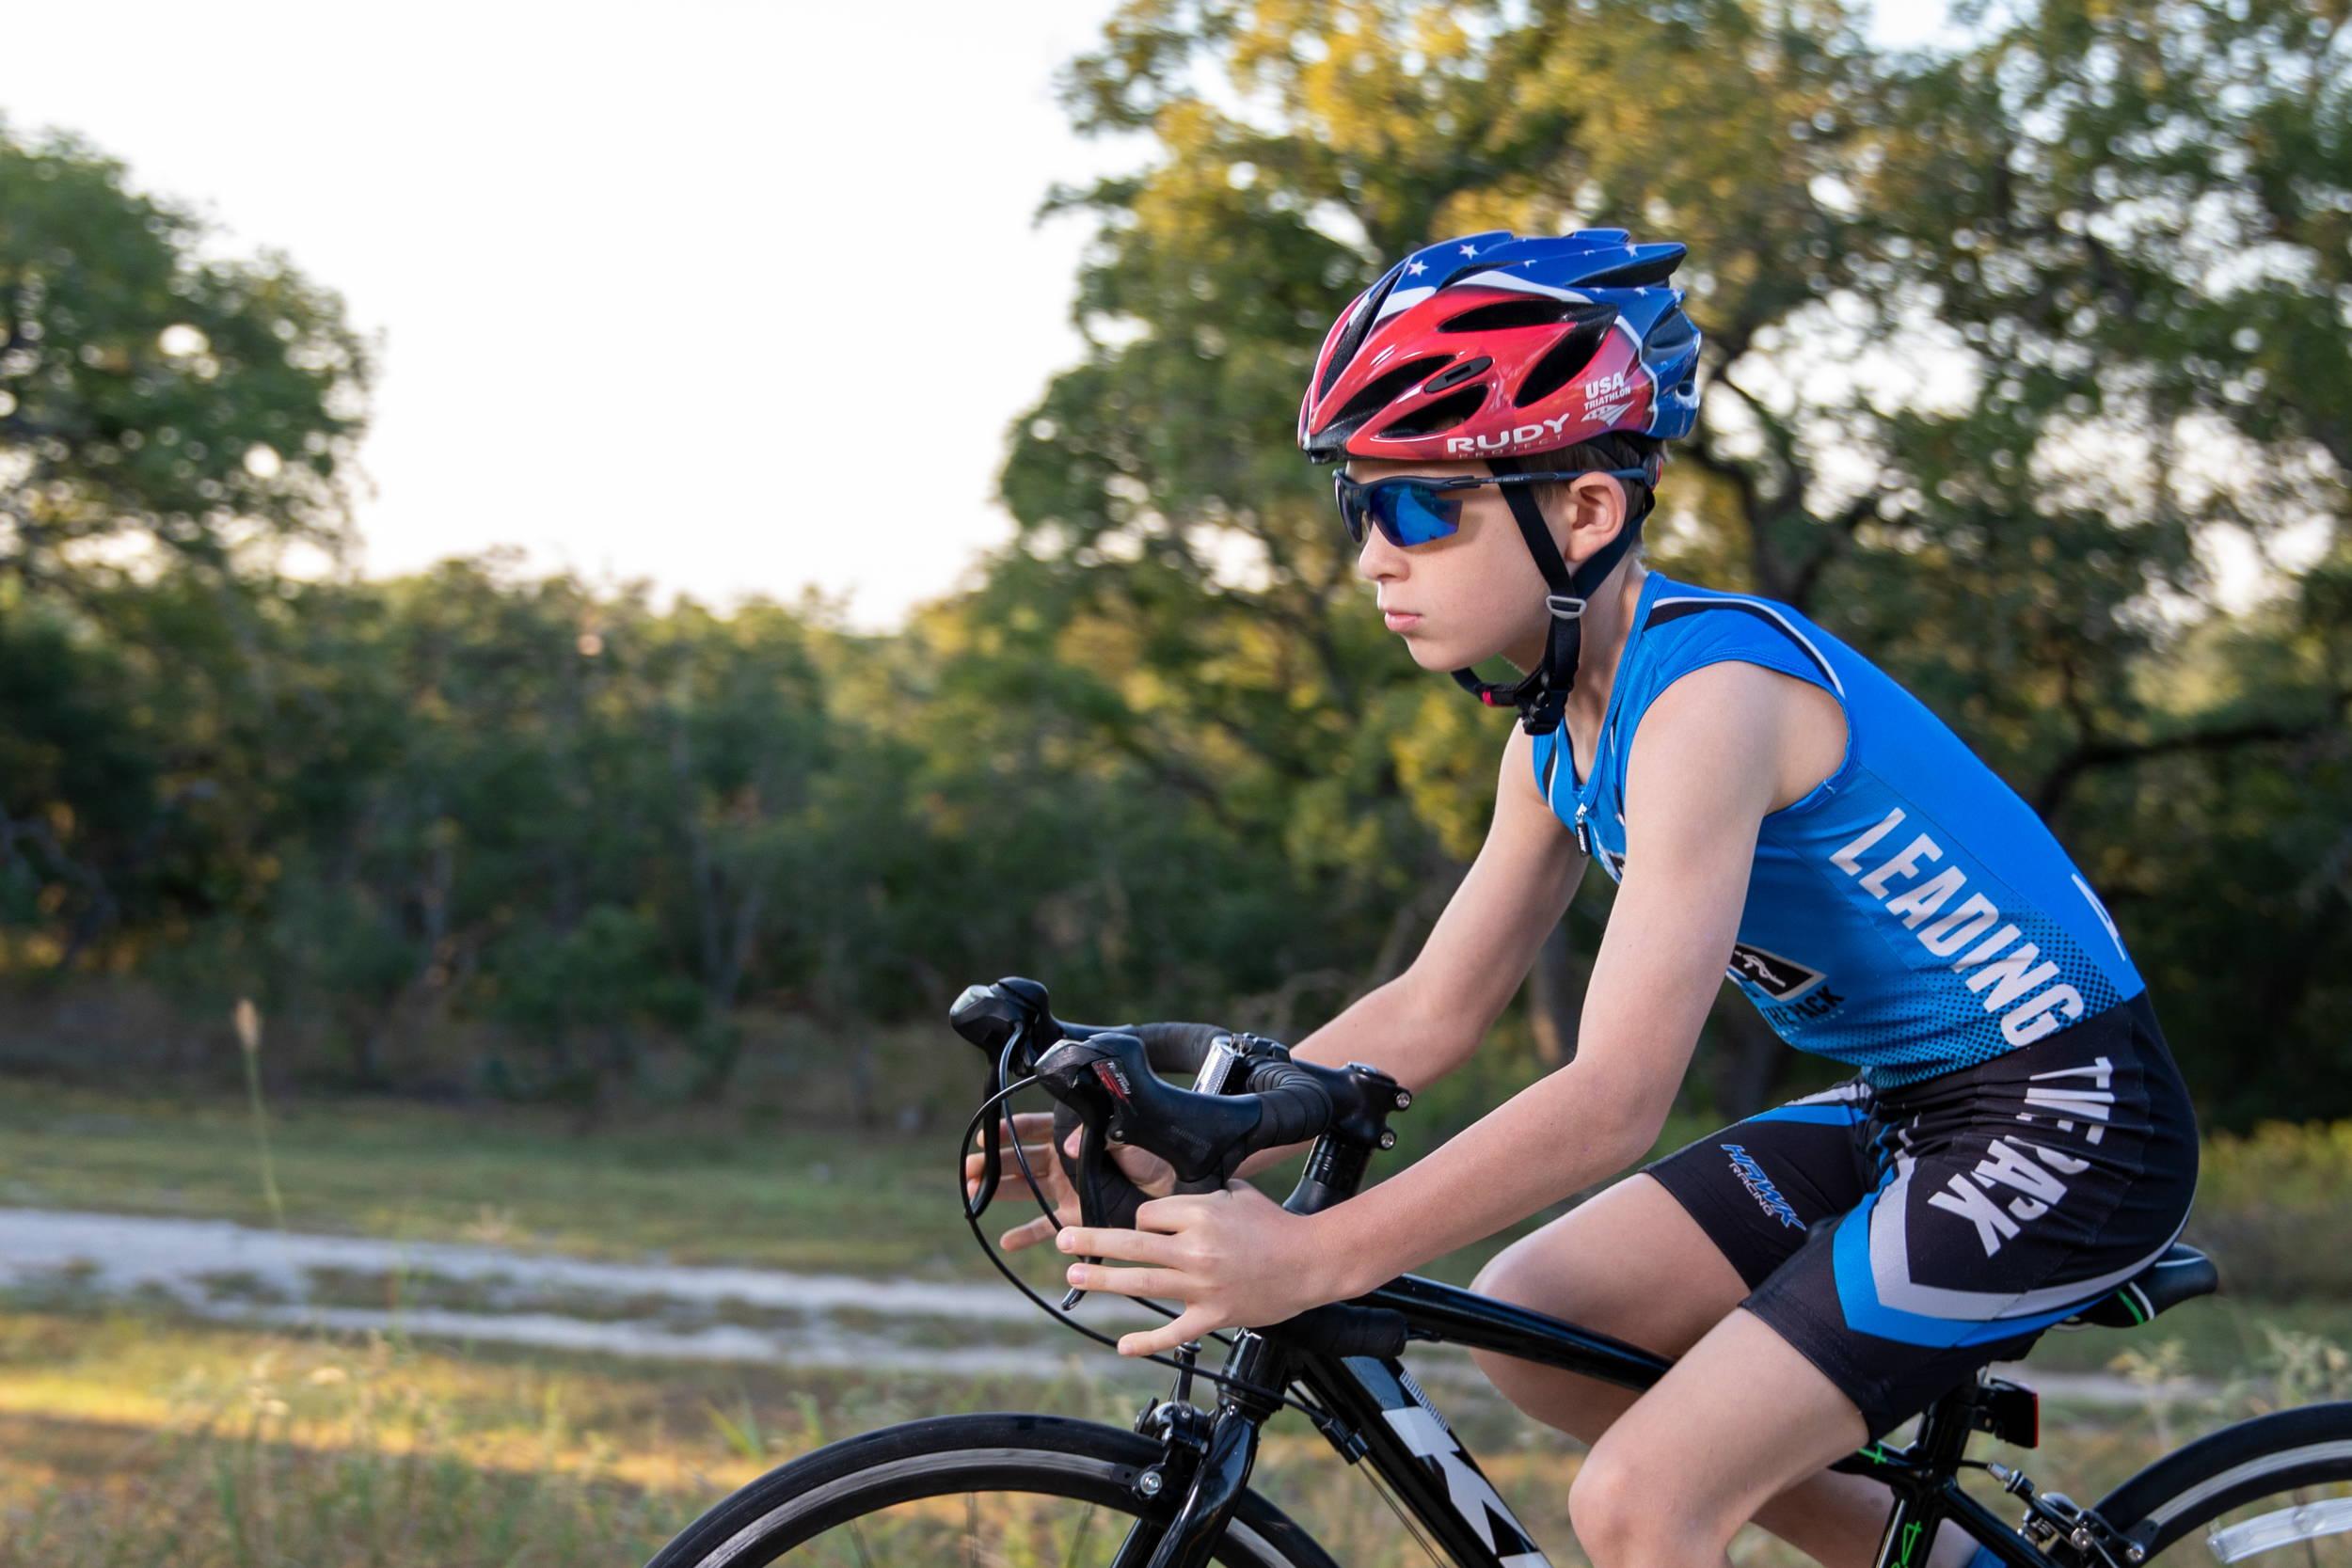 Rudy Project & USA Triathlon partnership Rush youth bike helmet worn by young boy